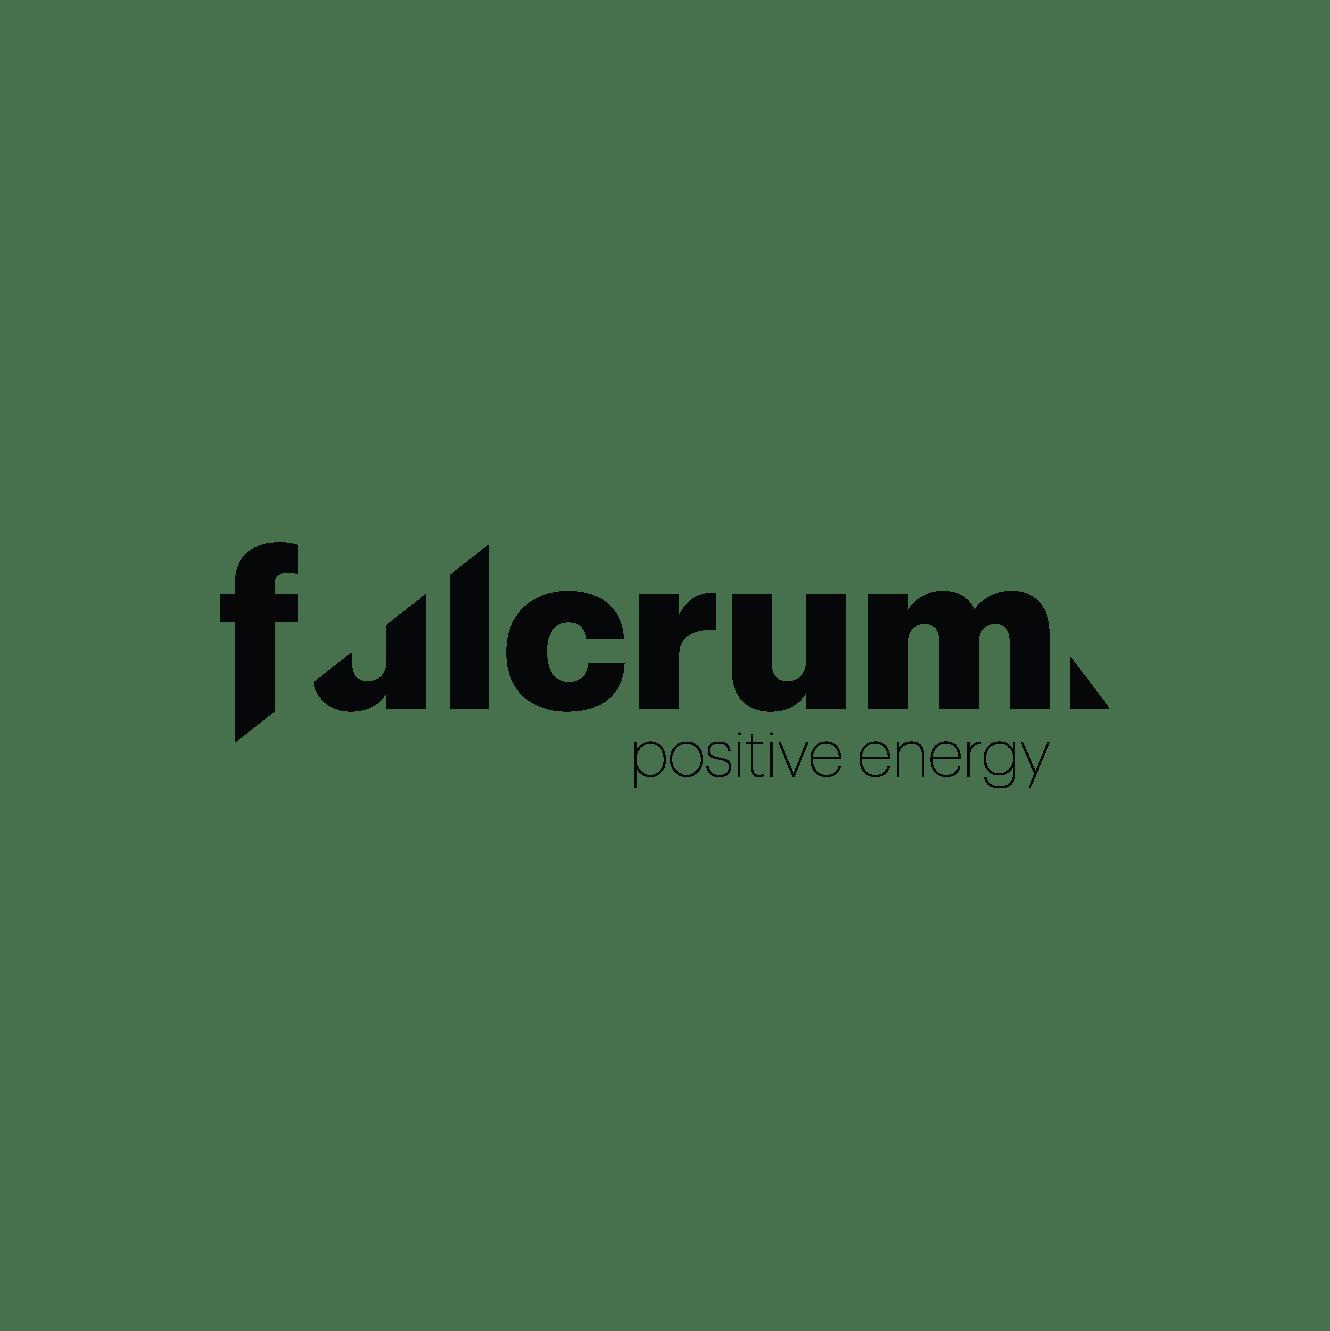 fulcrum_logosinitialselects_020419-13